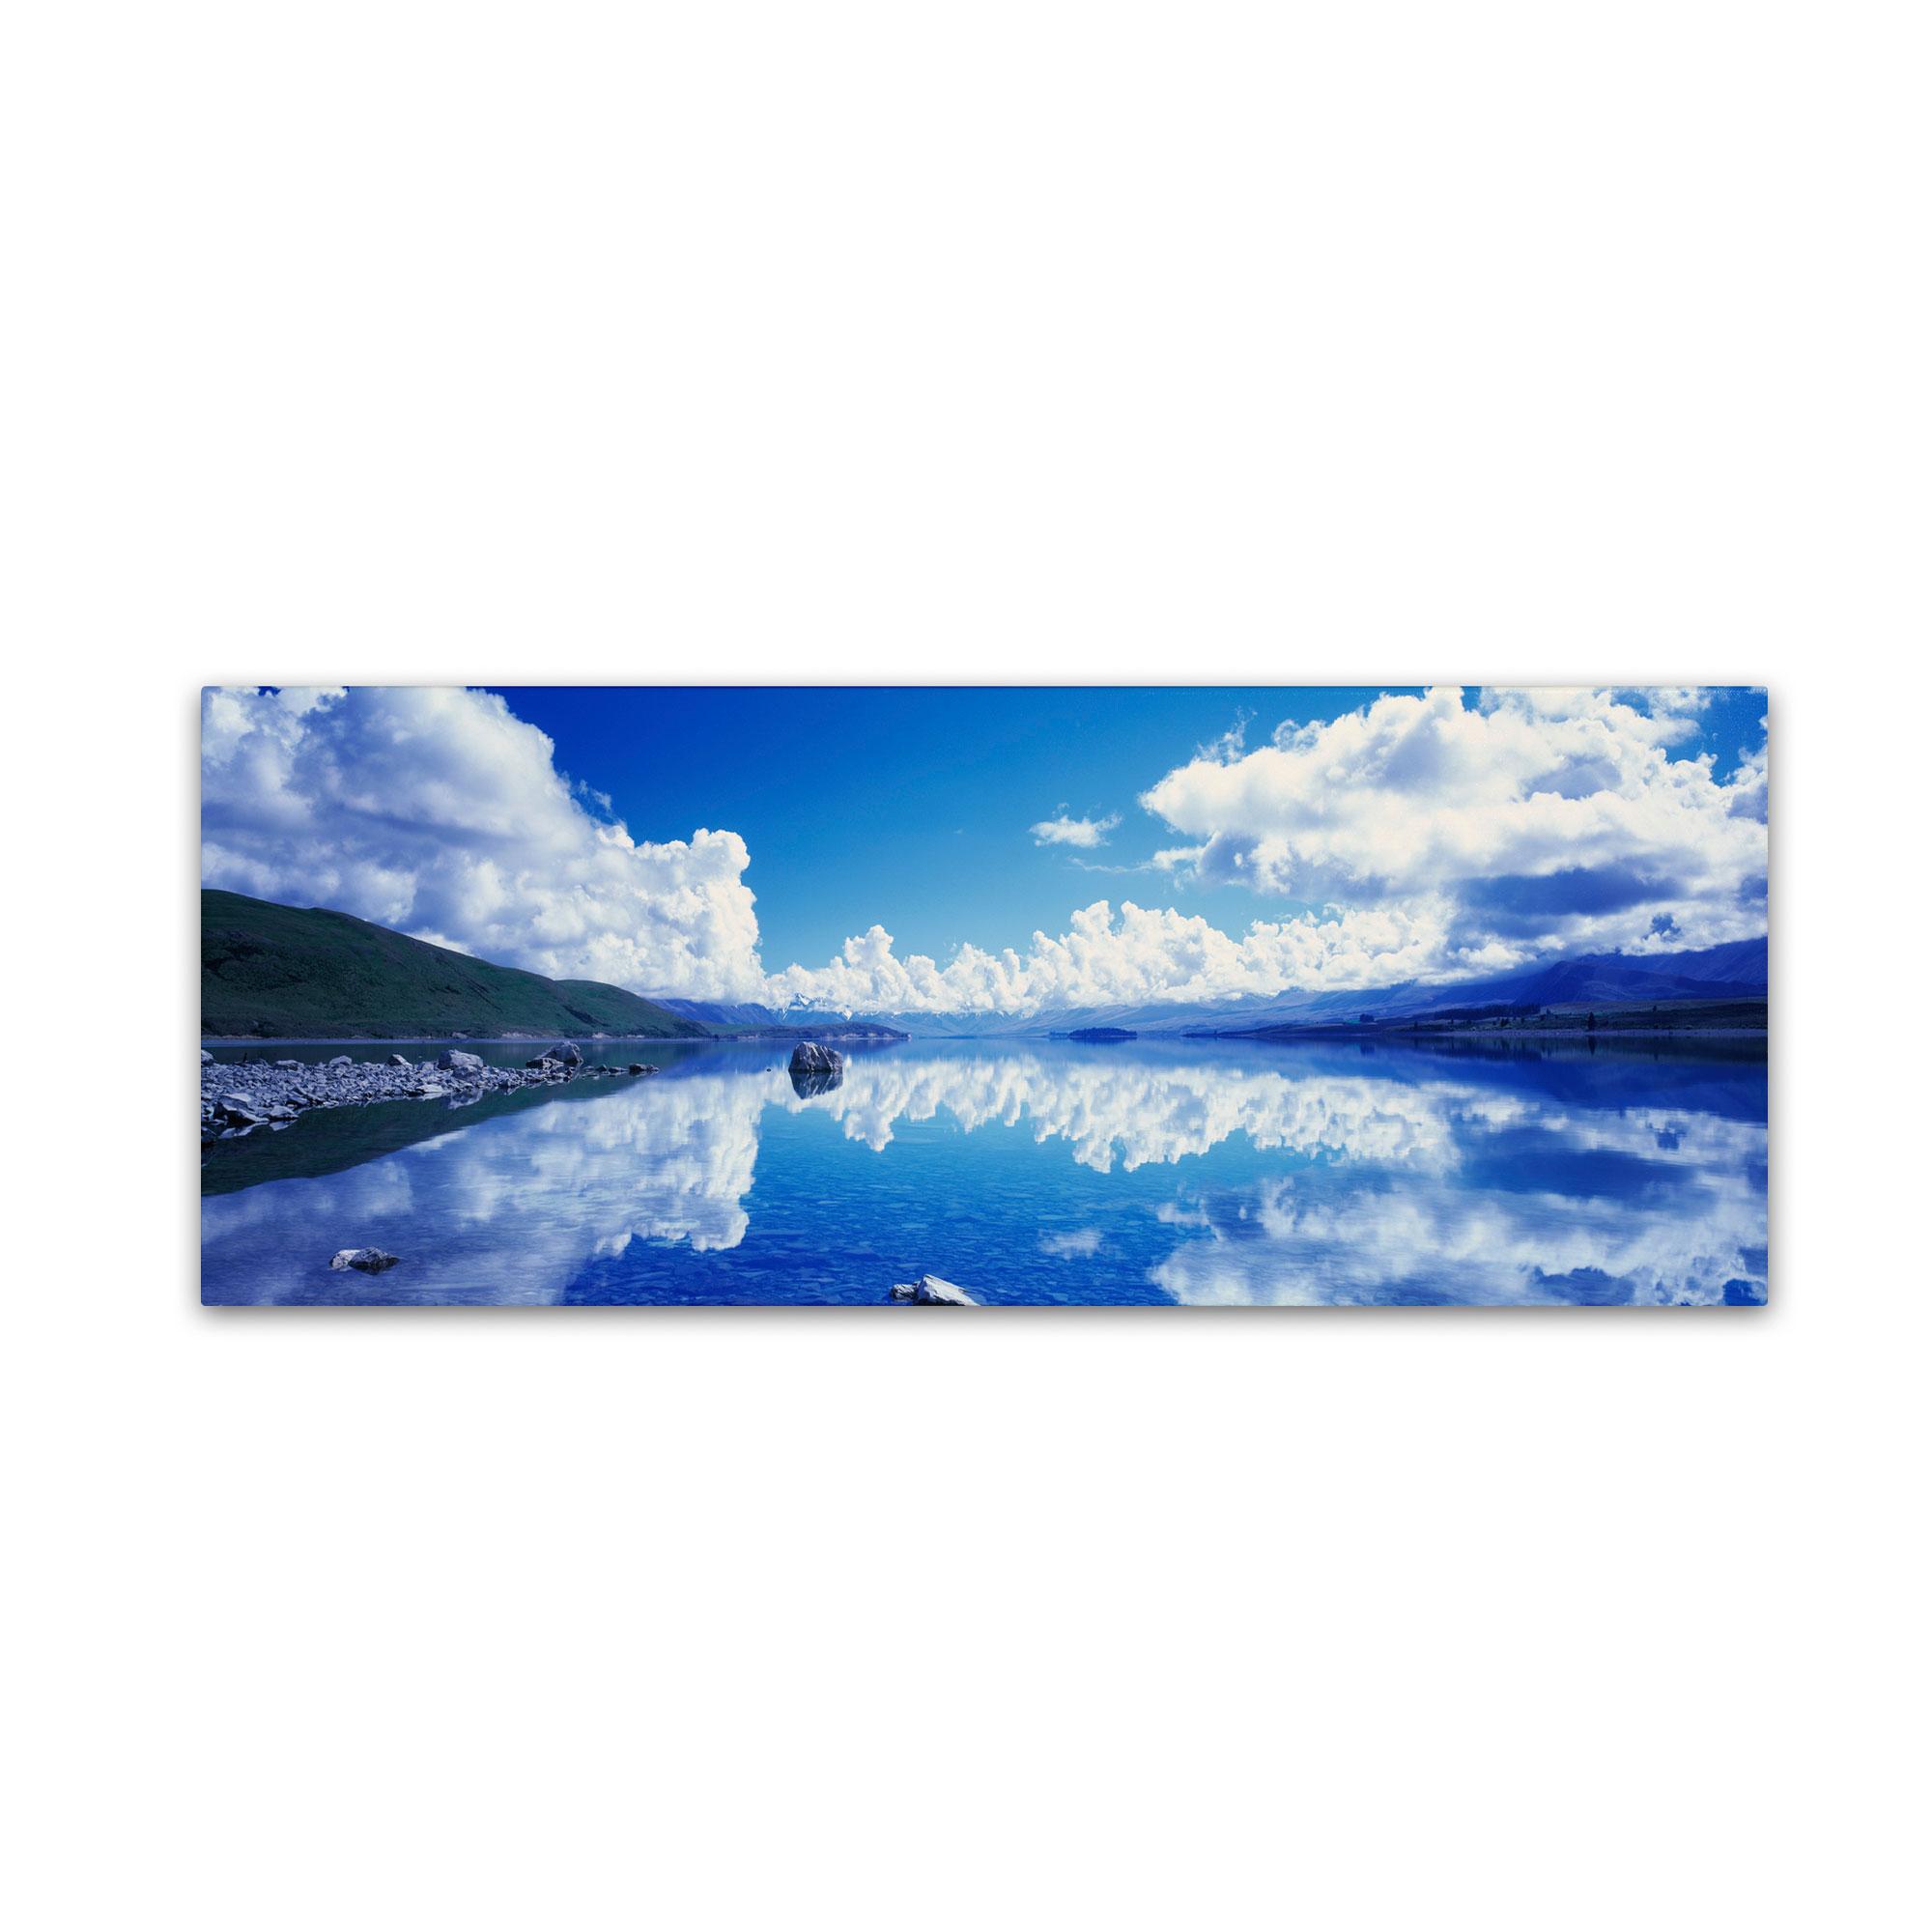 Trademark Fine Art David Evans 'Lake Tekapo Reflections-NZ' Canvas Art PartNumber: 021V002625207000P KsnValue: 2625207 MfgPartNumber: DE0050-C1032GG